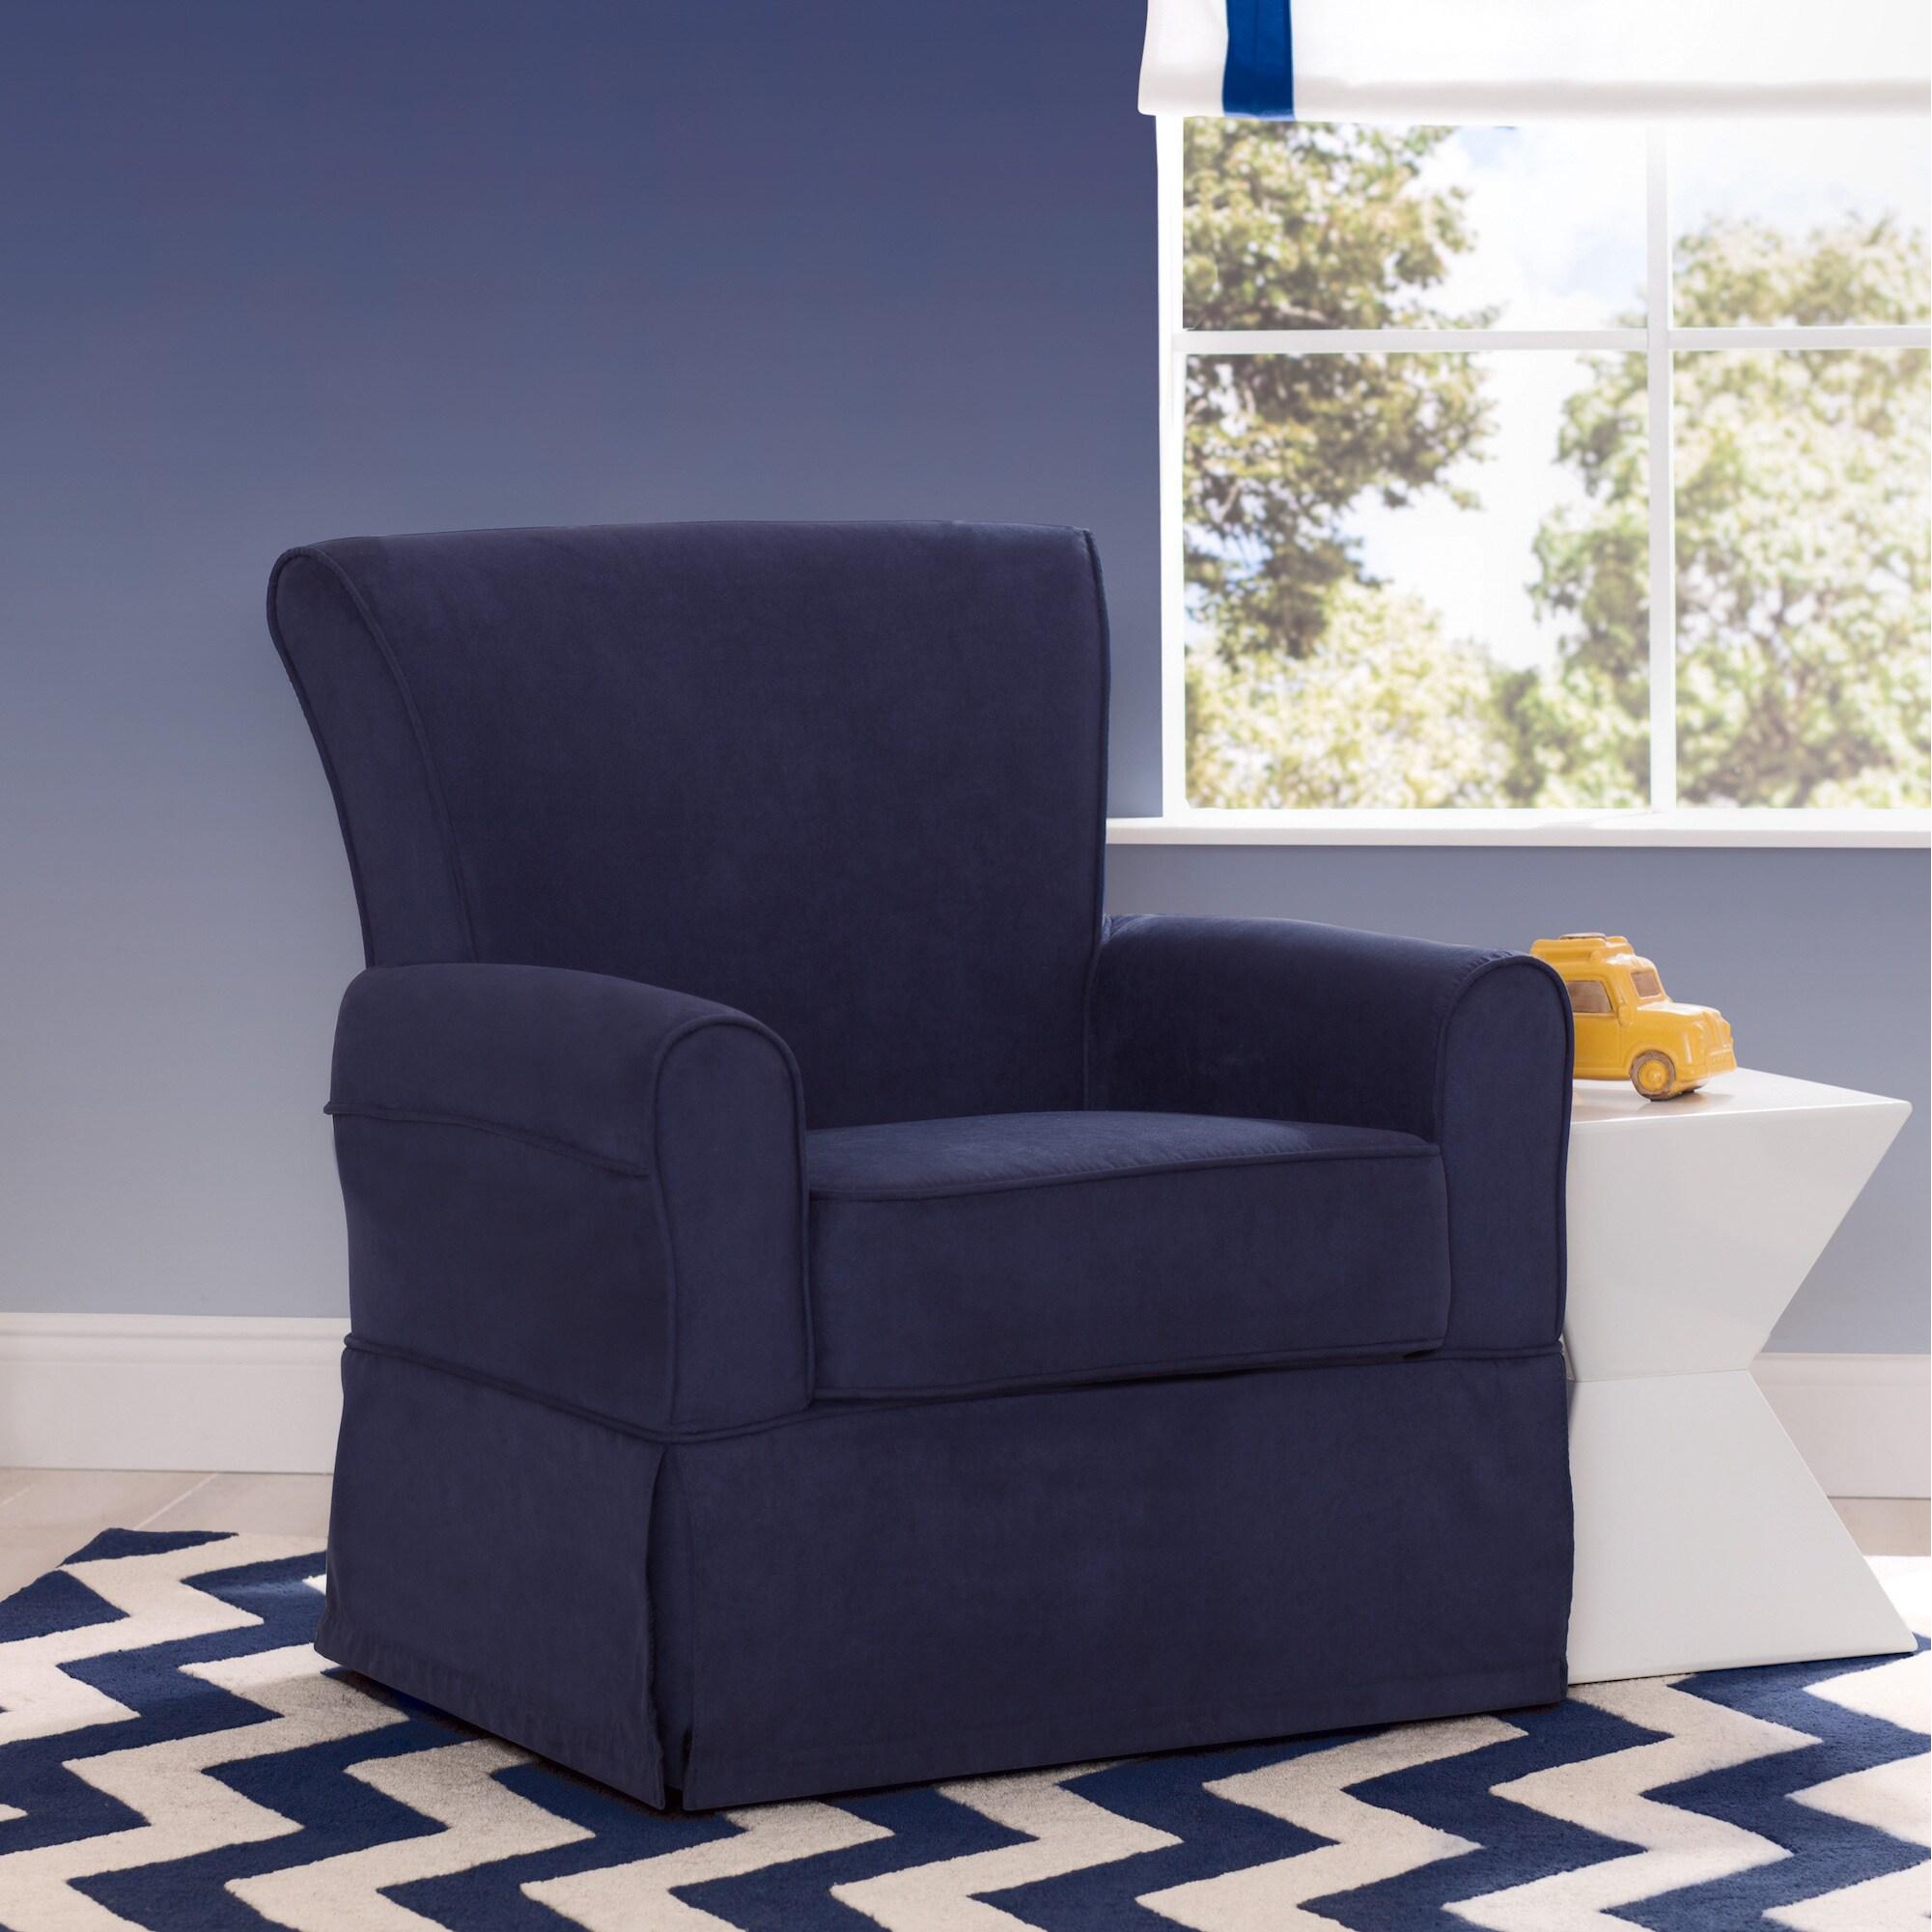 livings harper swivel delta glider dp room children for rocking blush in com chairs amazon rocker living cream chair